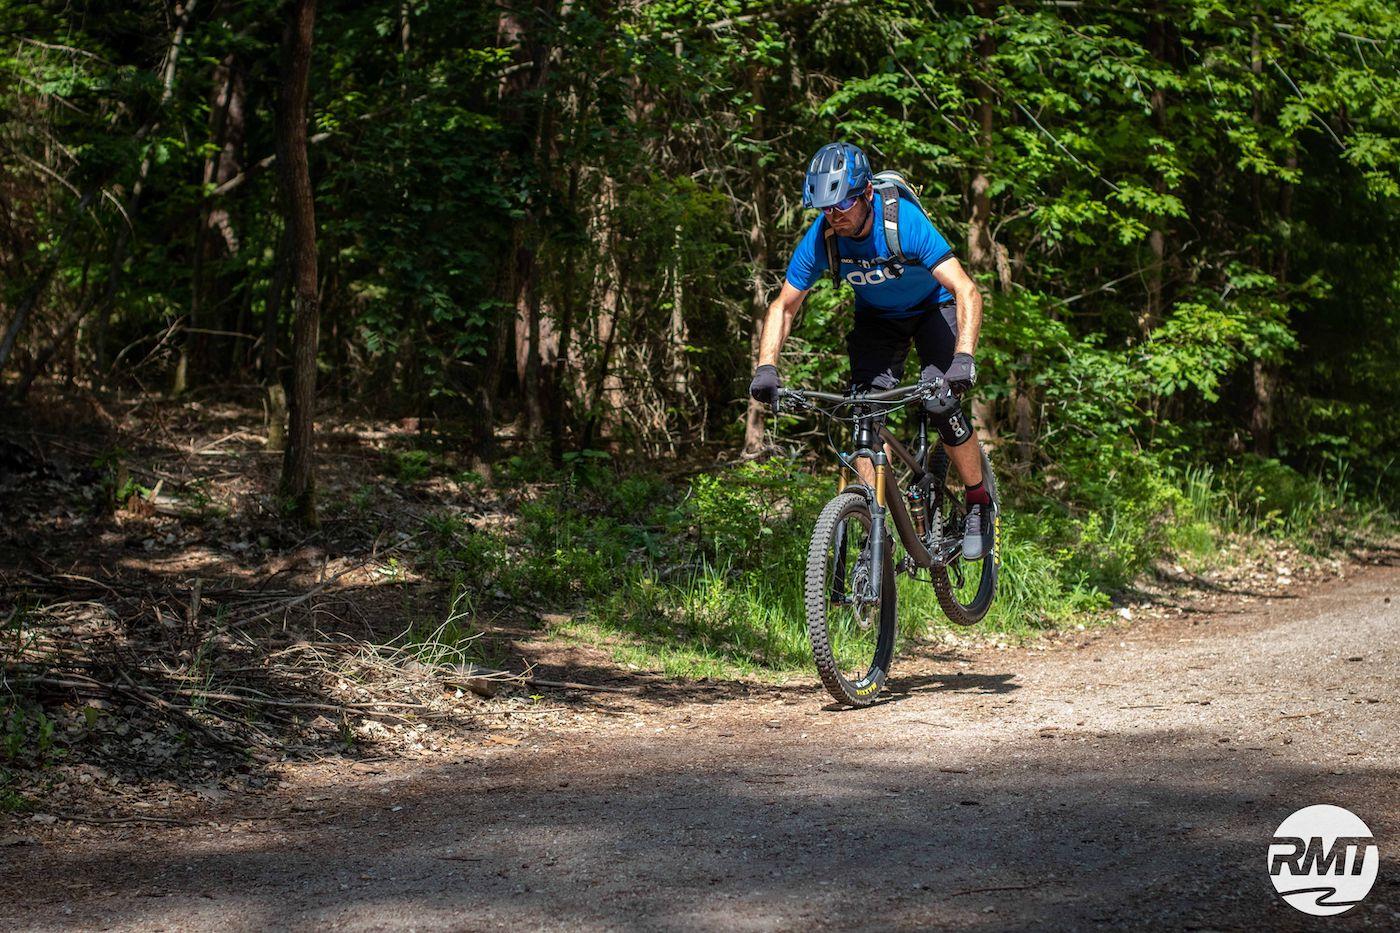 MTB Fahrtechnik Kurs Fortgeschrittene in Frankfurt  Taunus - Mountainbike Fortgeschritten - Rock my Trail Bikeschule - 1